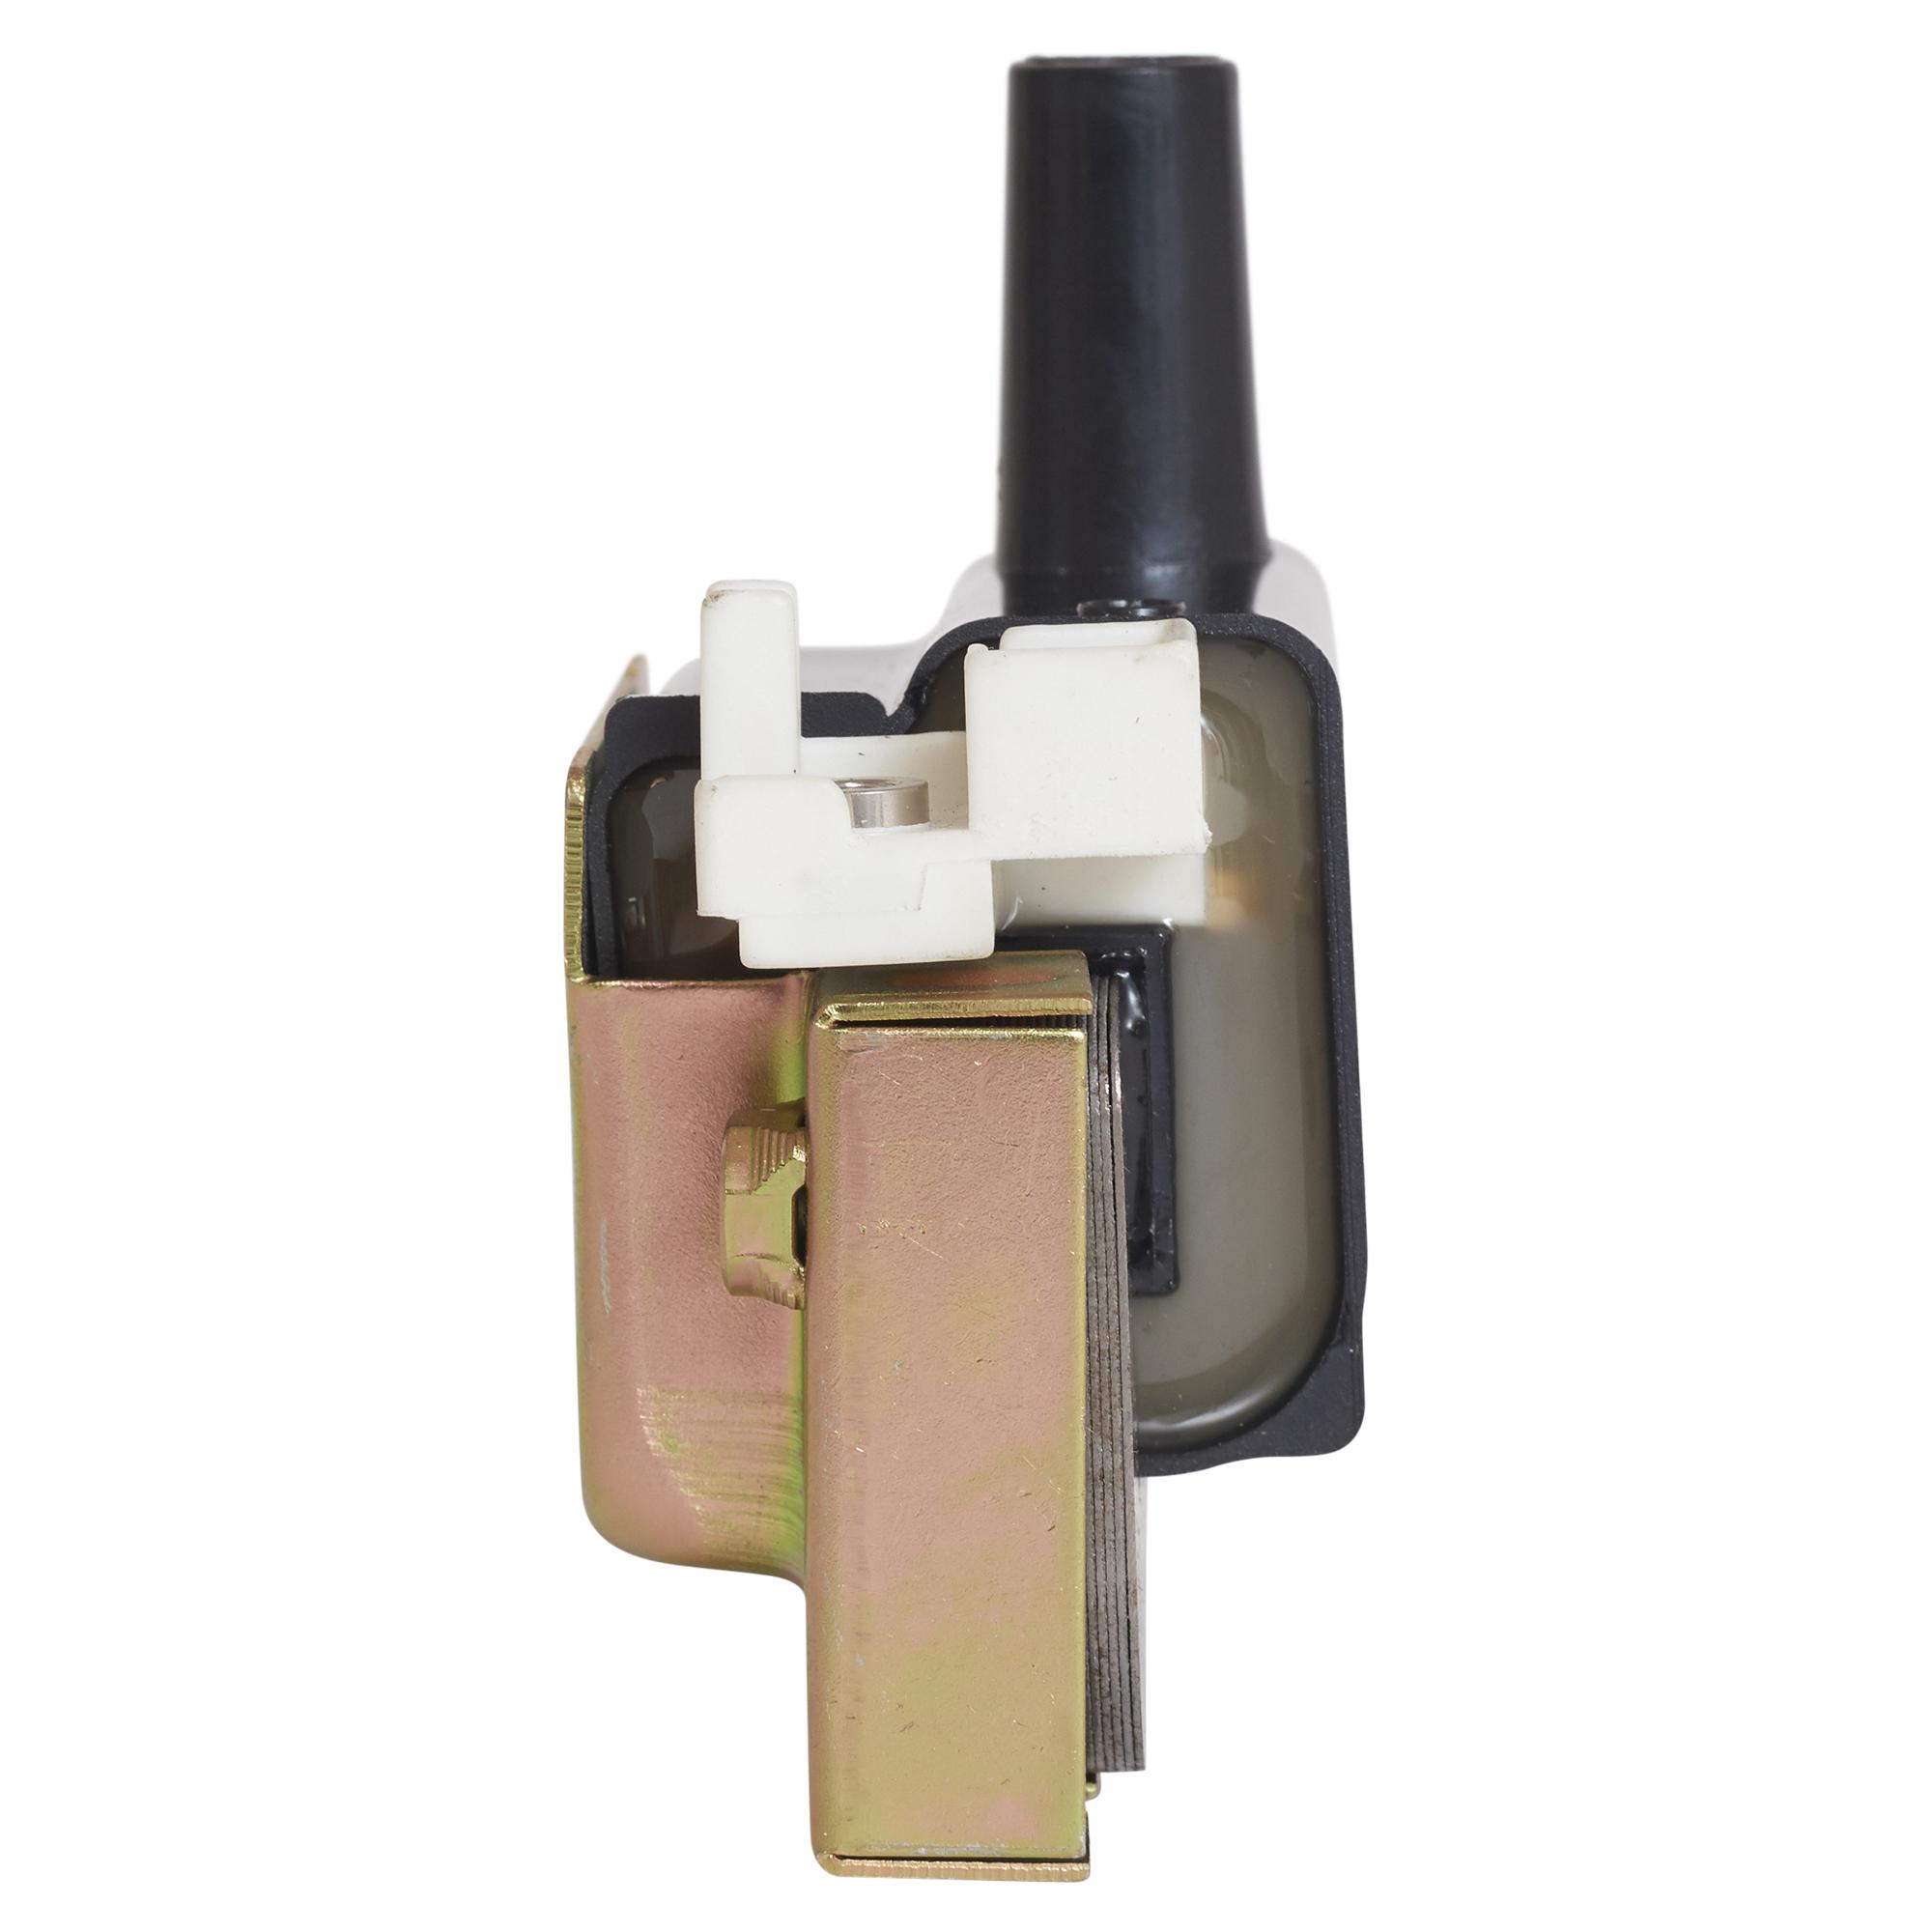 4 pc Ignition Coil Set for 02-06 Honda Accord Civic CR-V S2000 fits UF311 UF-311